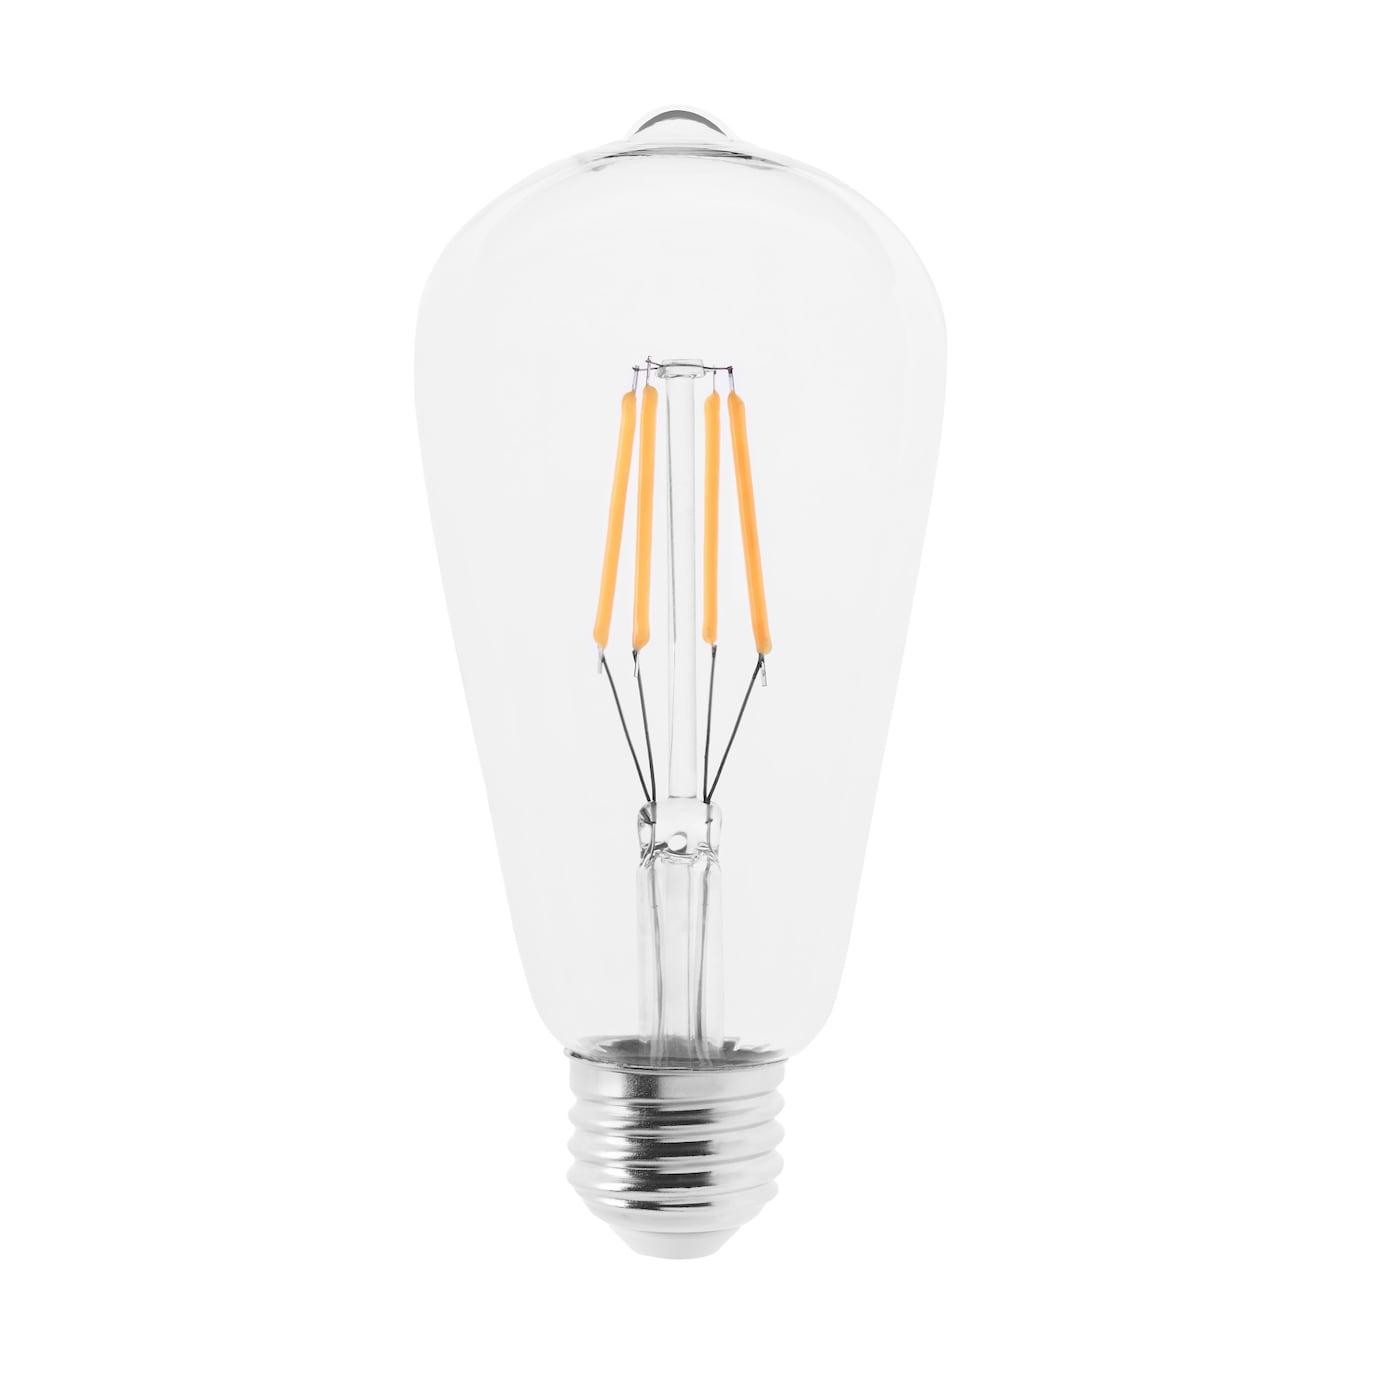 lunnom ampoule led e27 400 lumen forme de goutte verre transparent 64 mm ikea. Black Bedroom Furniture Sets. Home Design Ideas